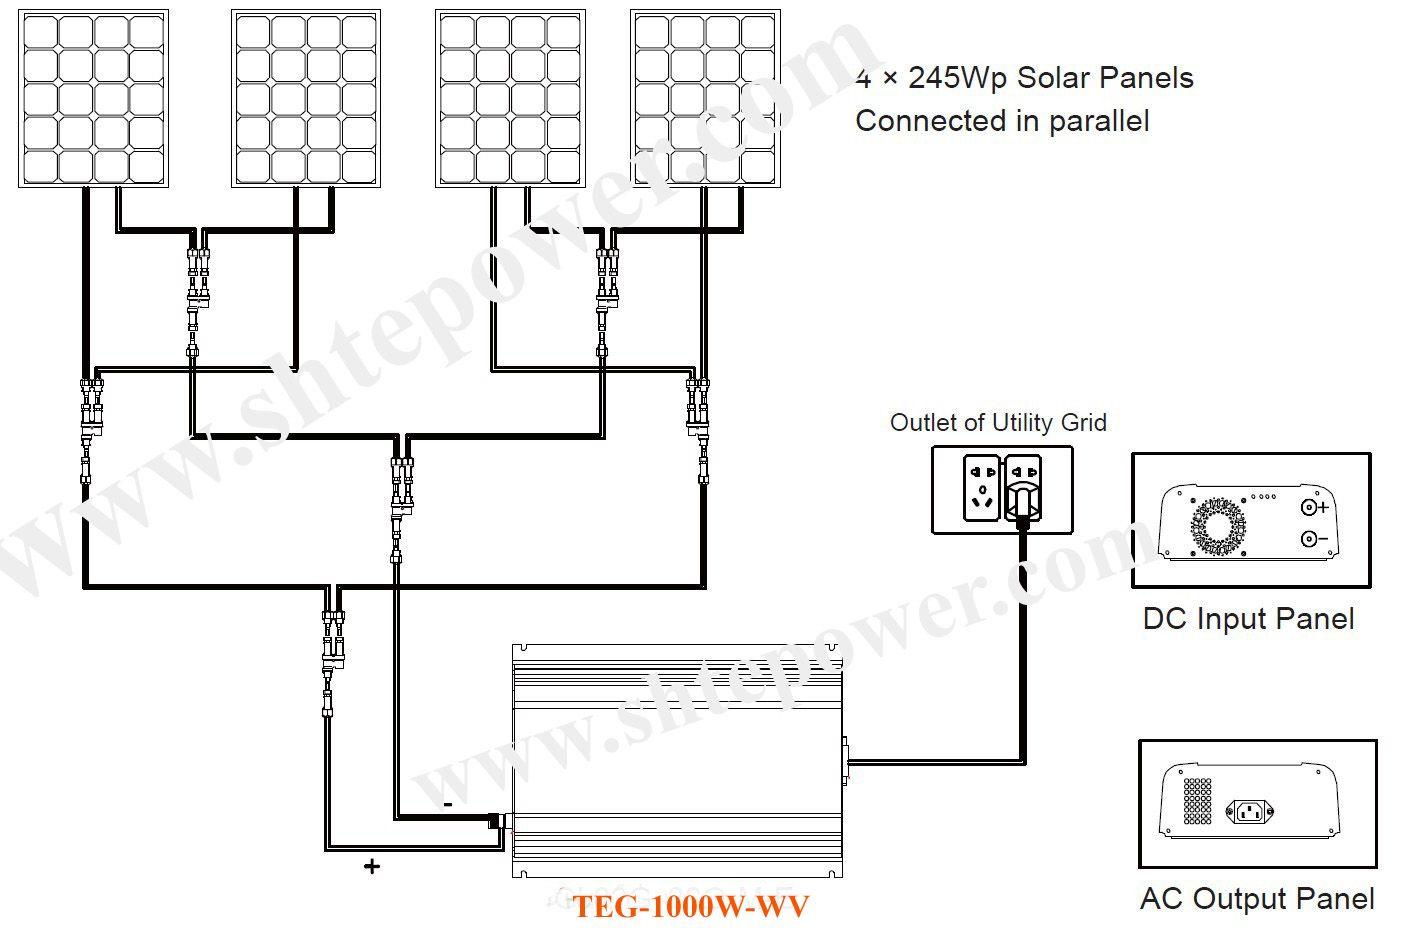 pv inverter wiring diagram 1989 toyota pickup 22re grid tie inverters 1500w 1 5kw